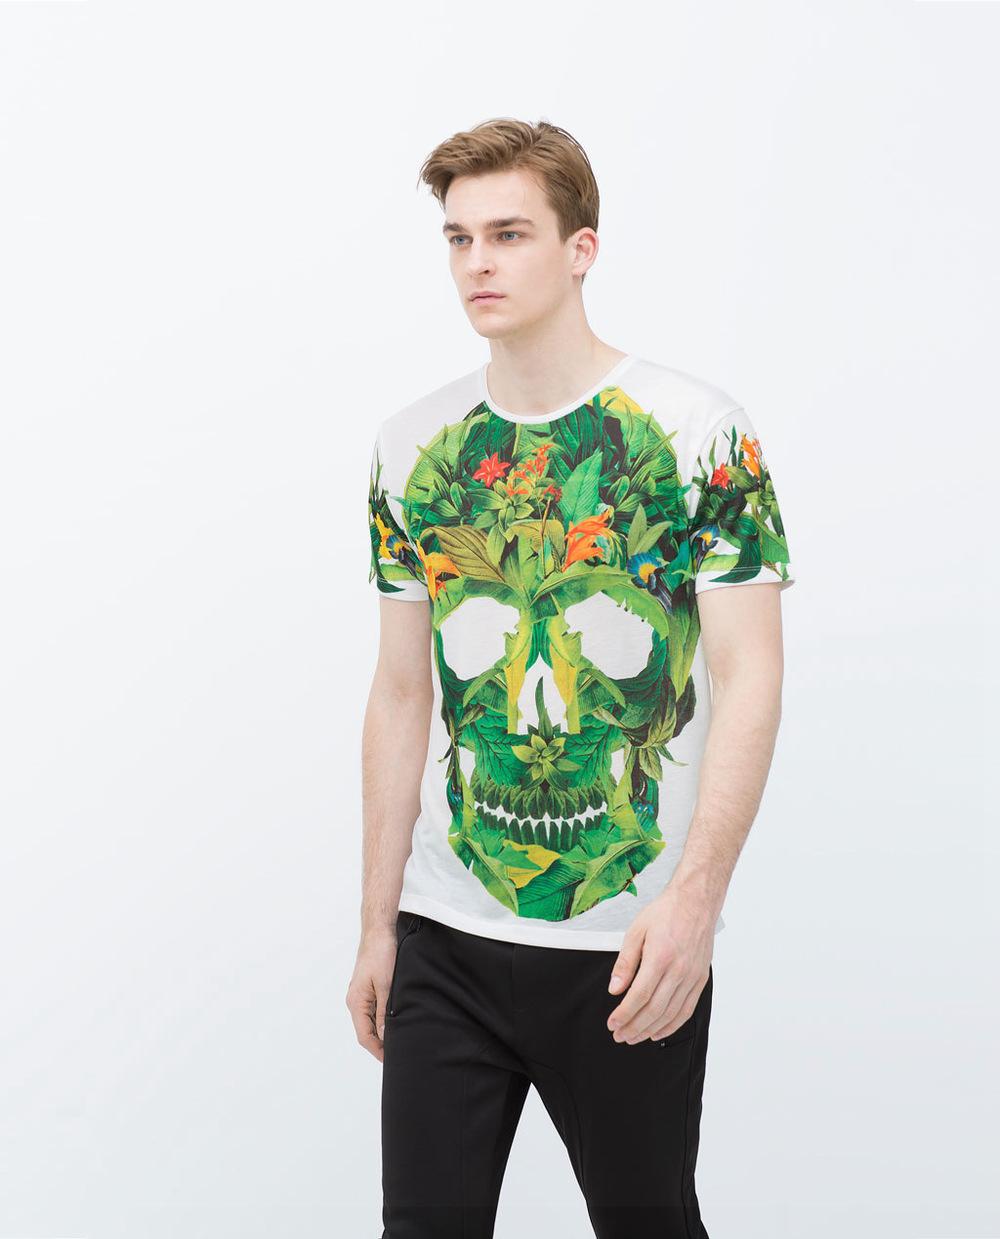 Ref 0722 436 brand designer hot za 2015 summer new tshirt for Zara mens floral shirt